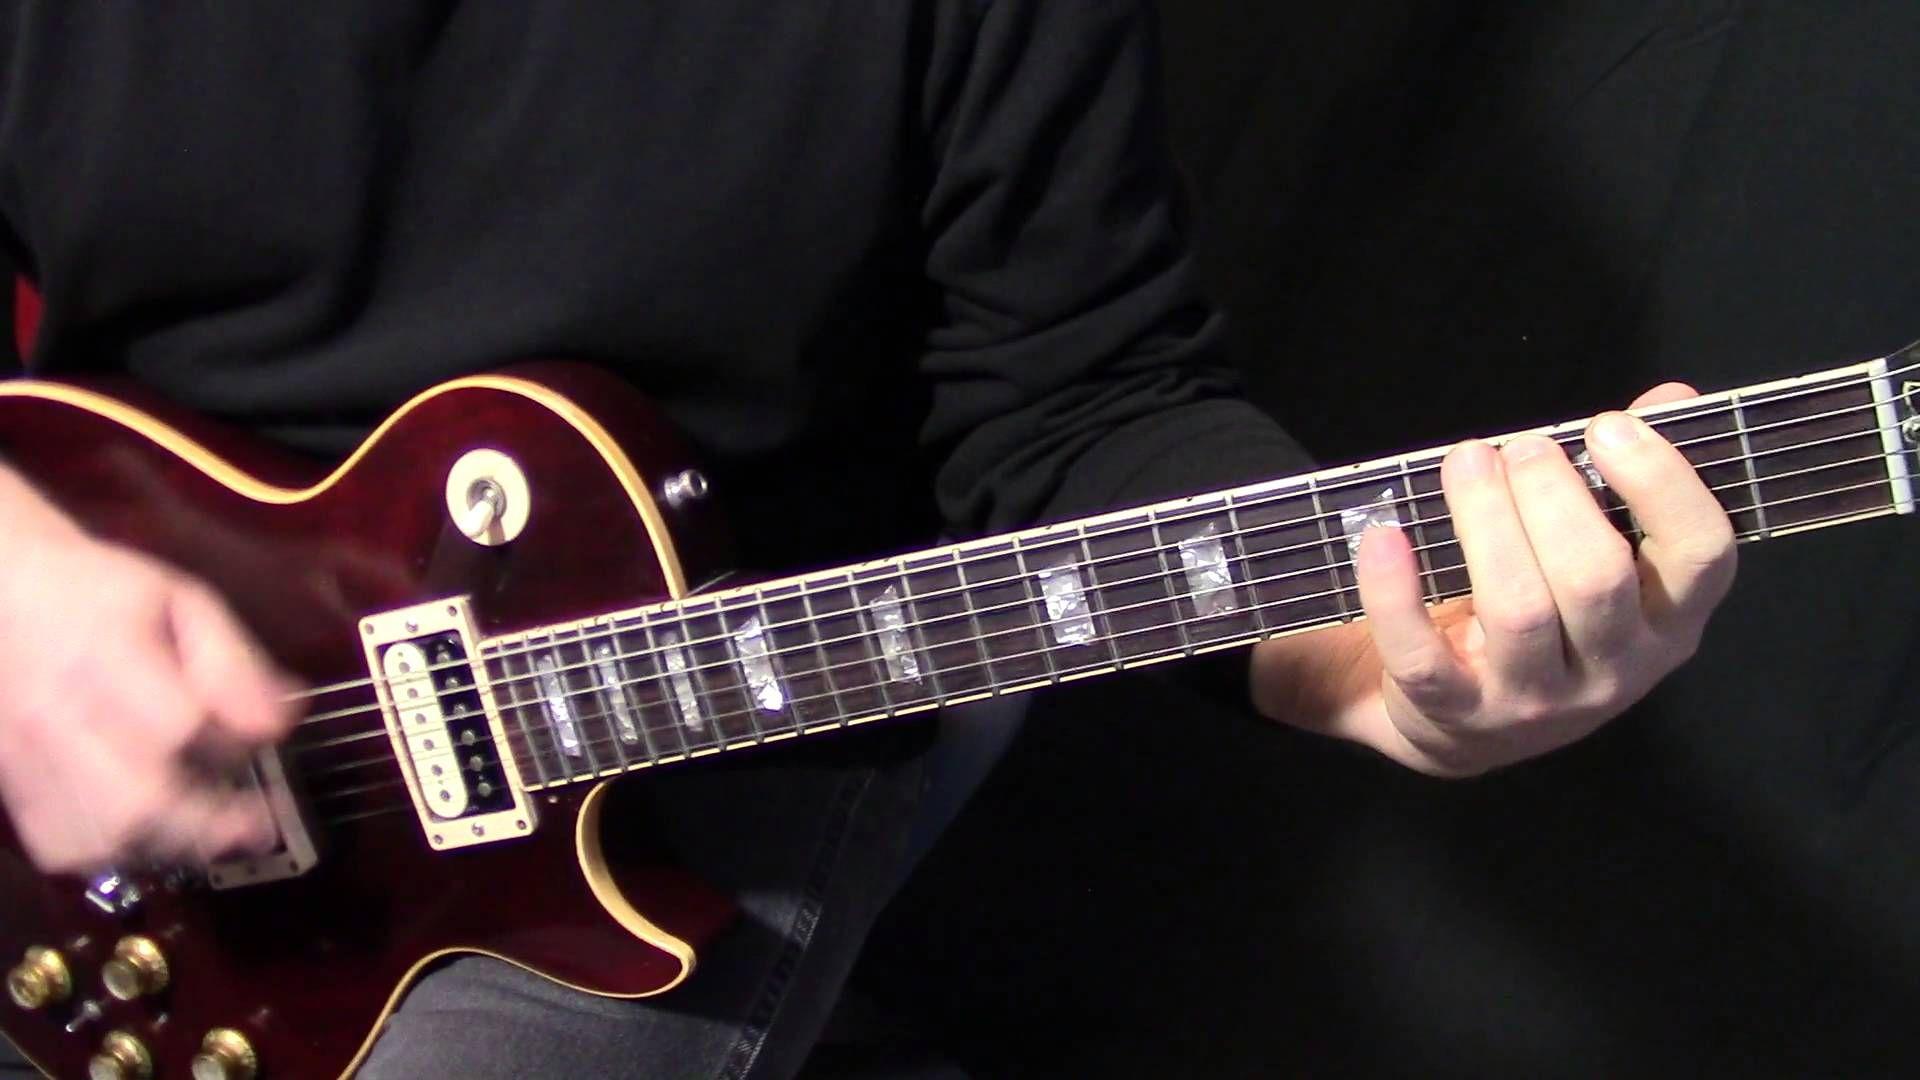 How To Play Sweet Emotion On Guitar By Aerosmith Rhythm Guitar